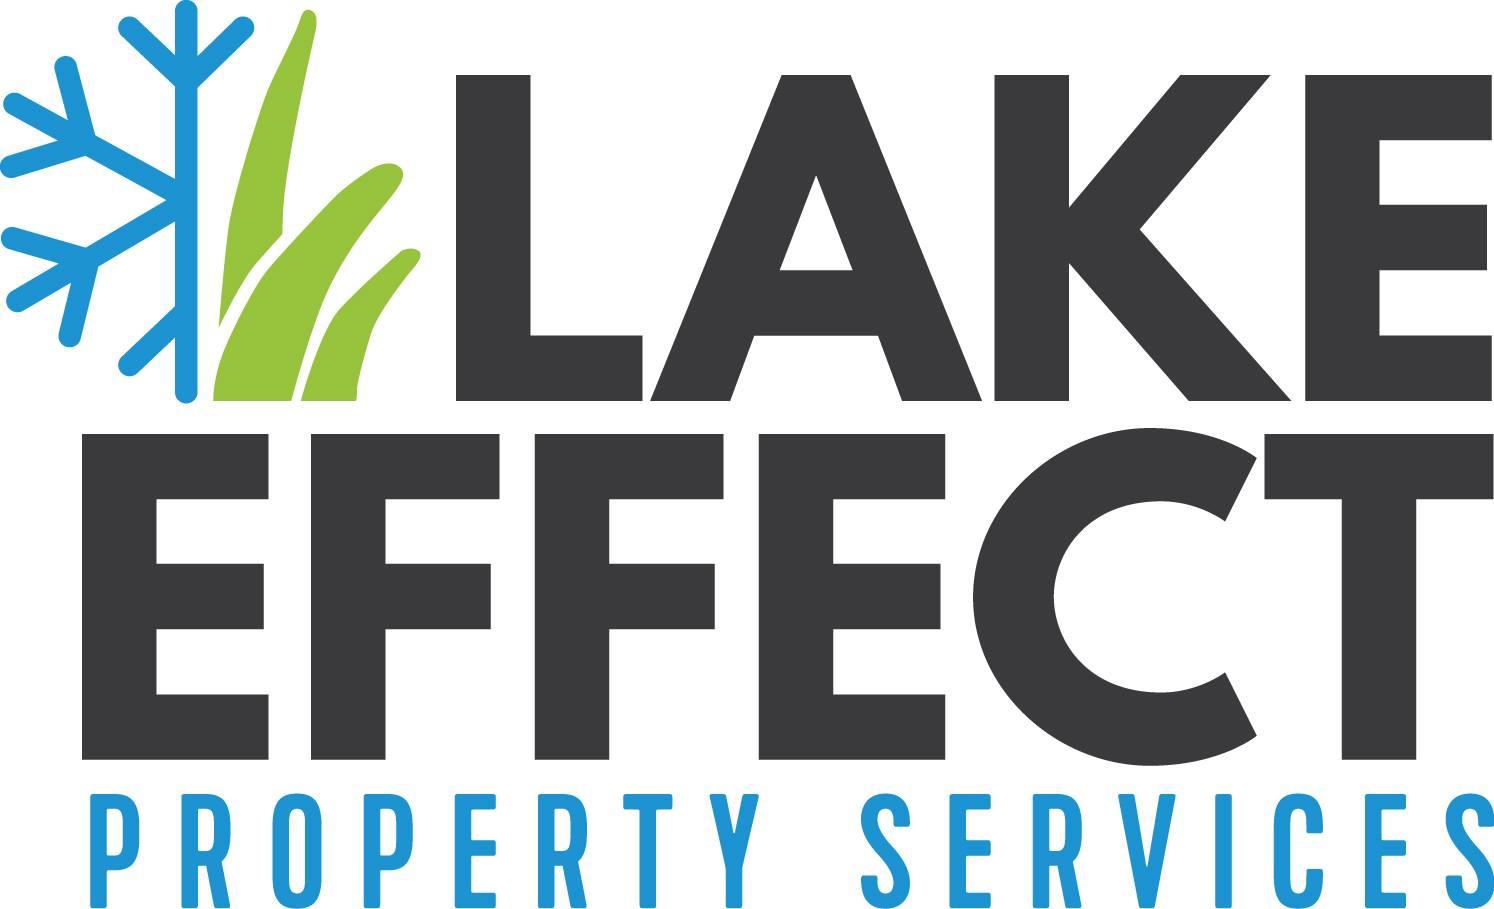 lake effect whole logo.jpg